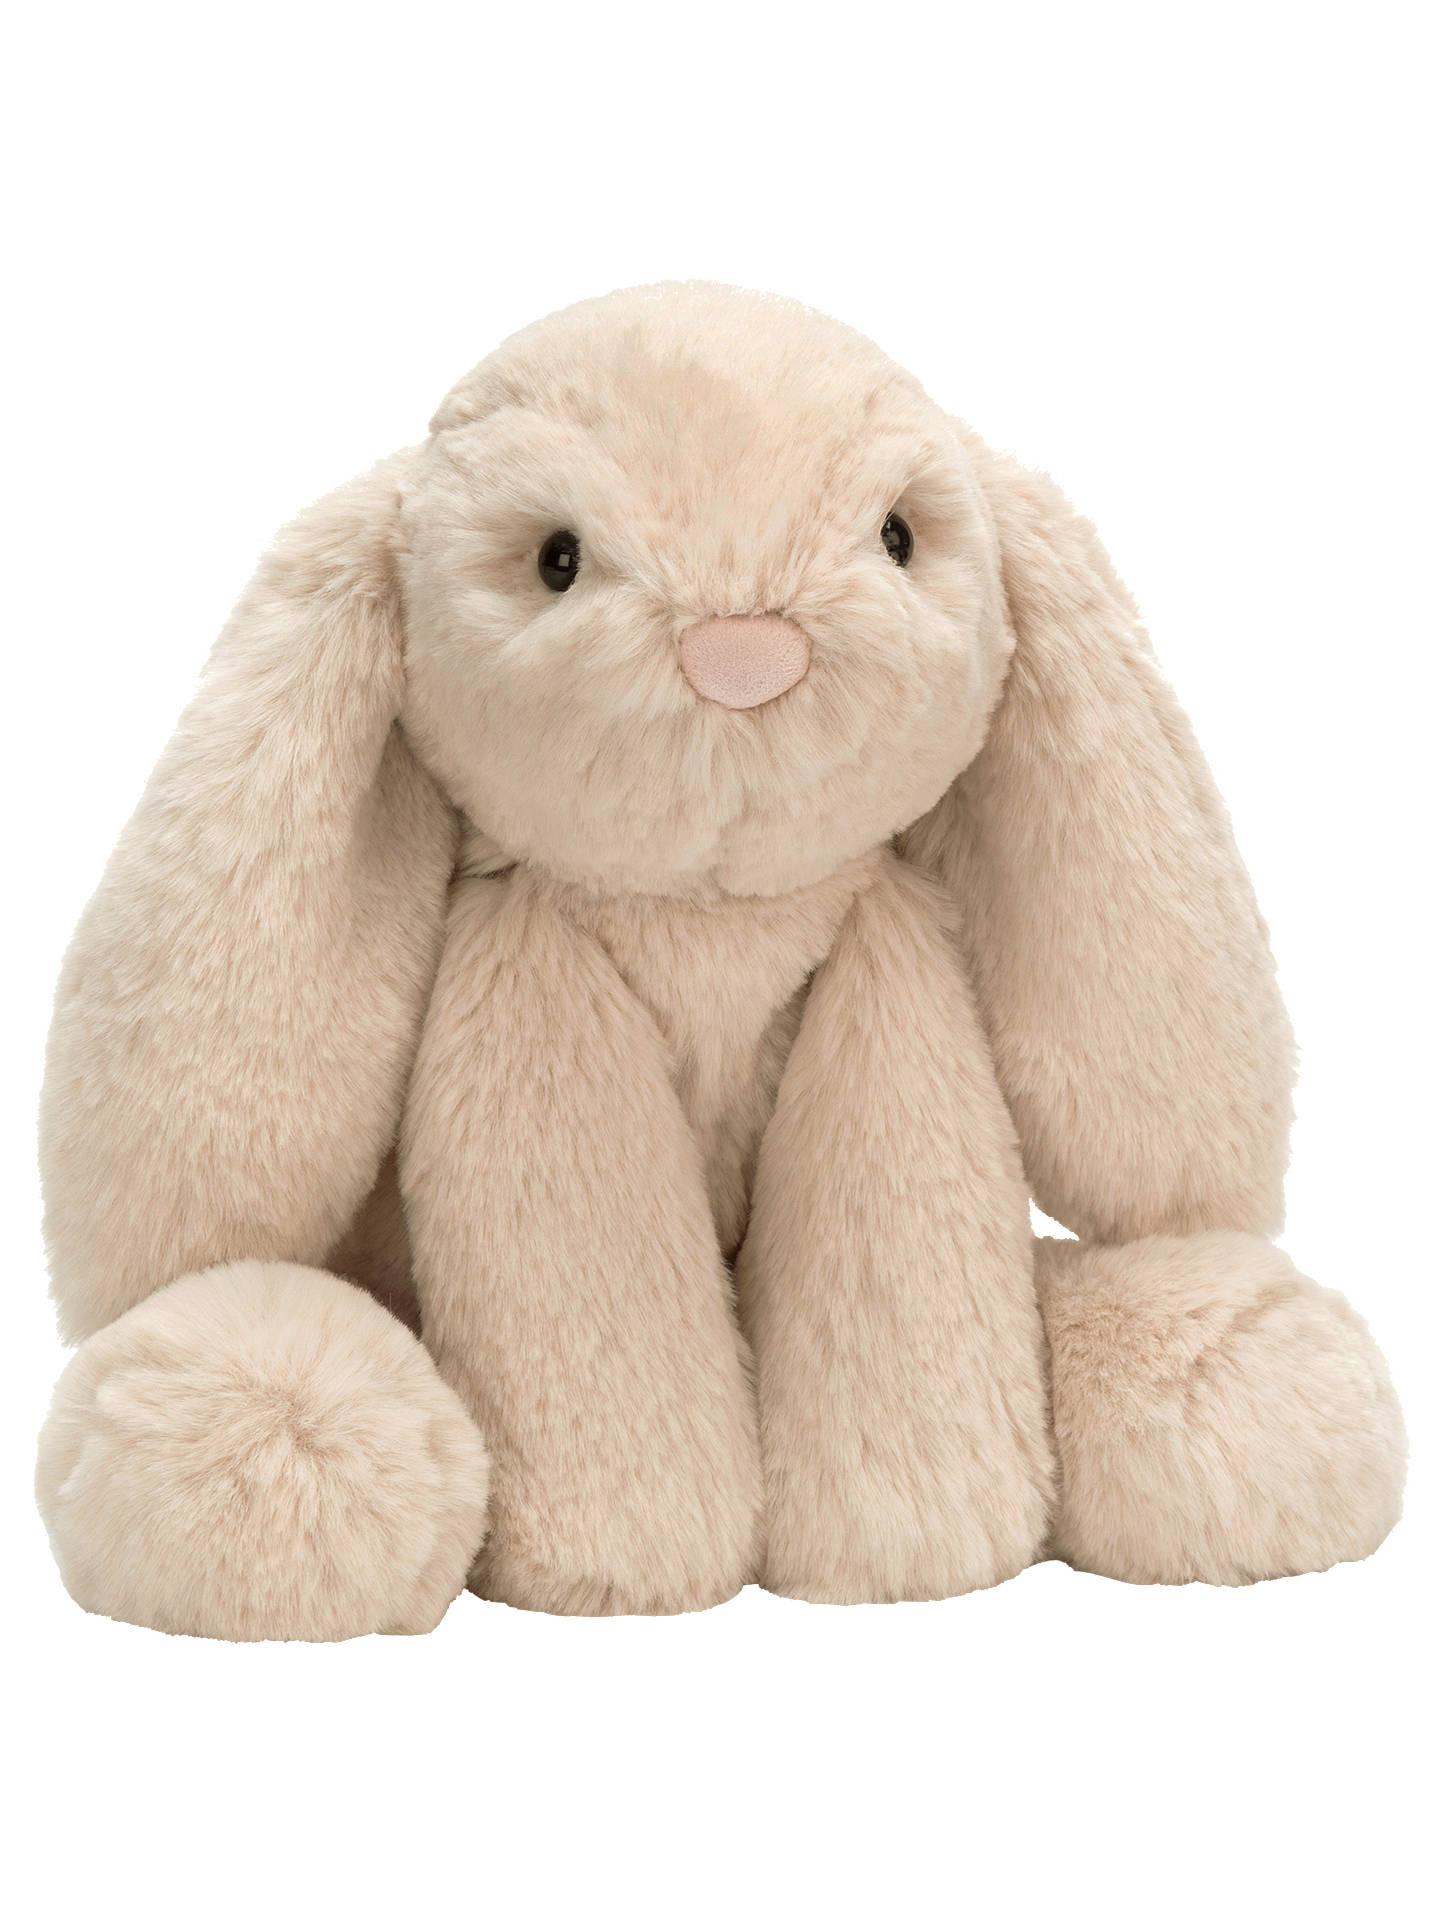 5ebfb228ea3 Buy Jellycat Smudge Rabbit Soft Toy